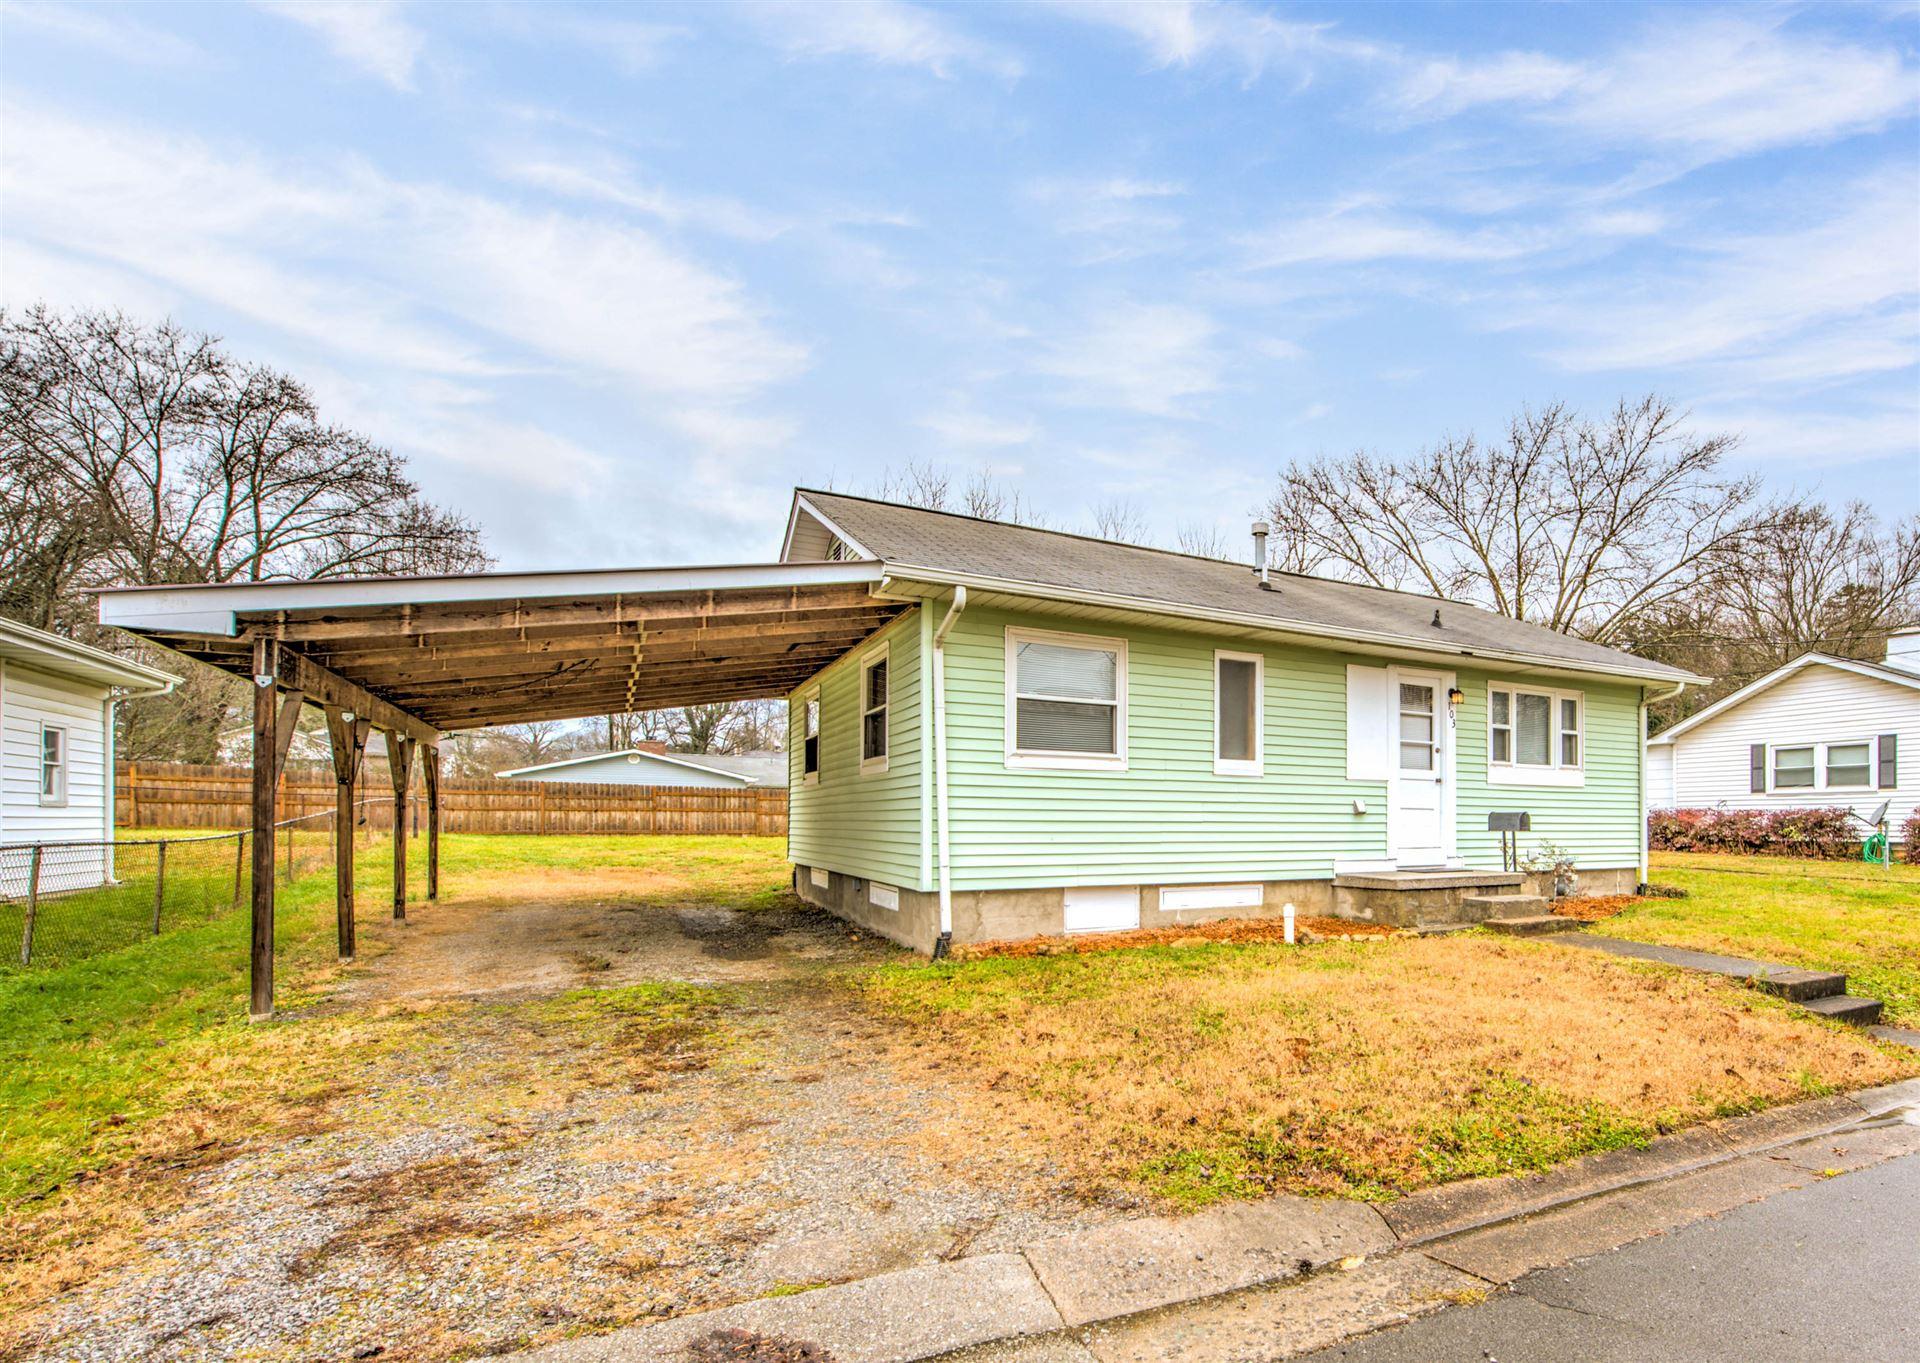 Photo of 103 Tilden Rd, Oak Ridge, TN 37830 (MLS # 1139620)